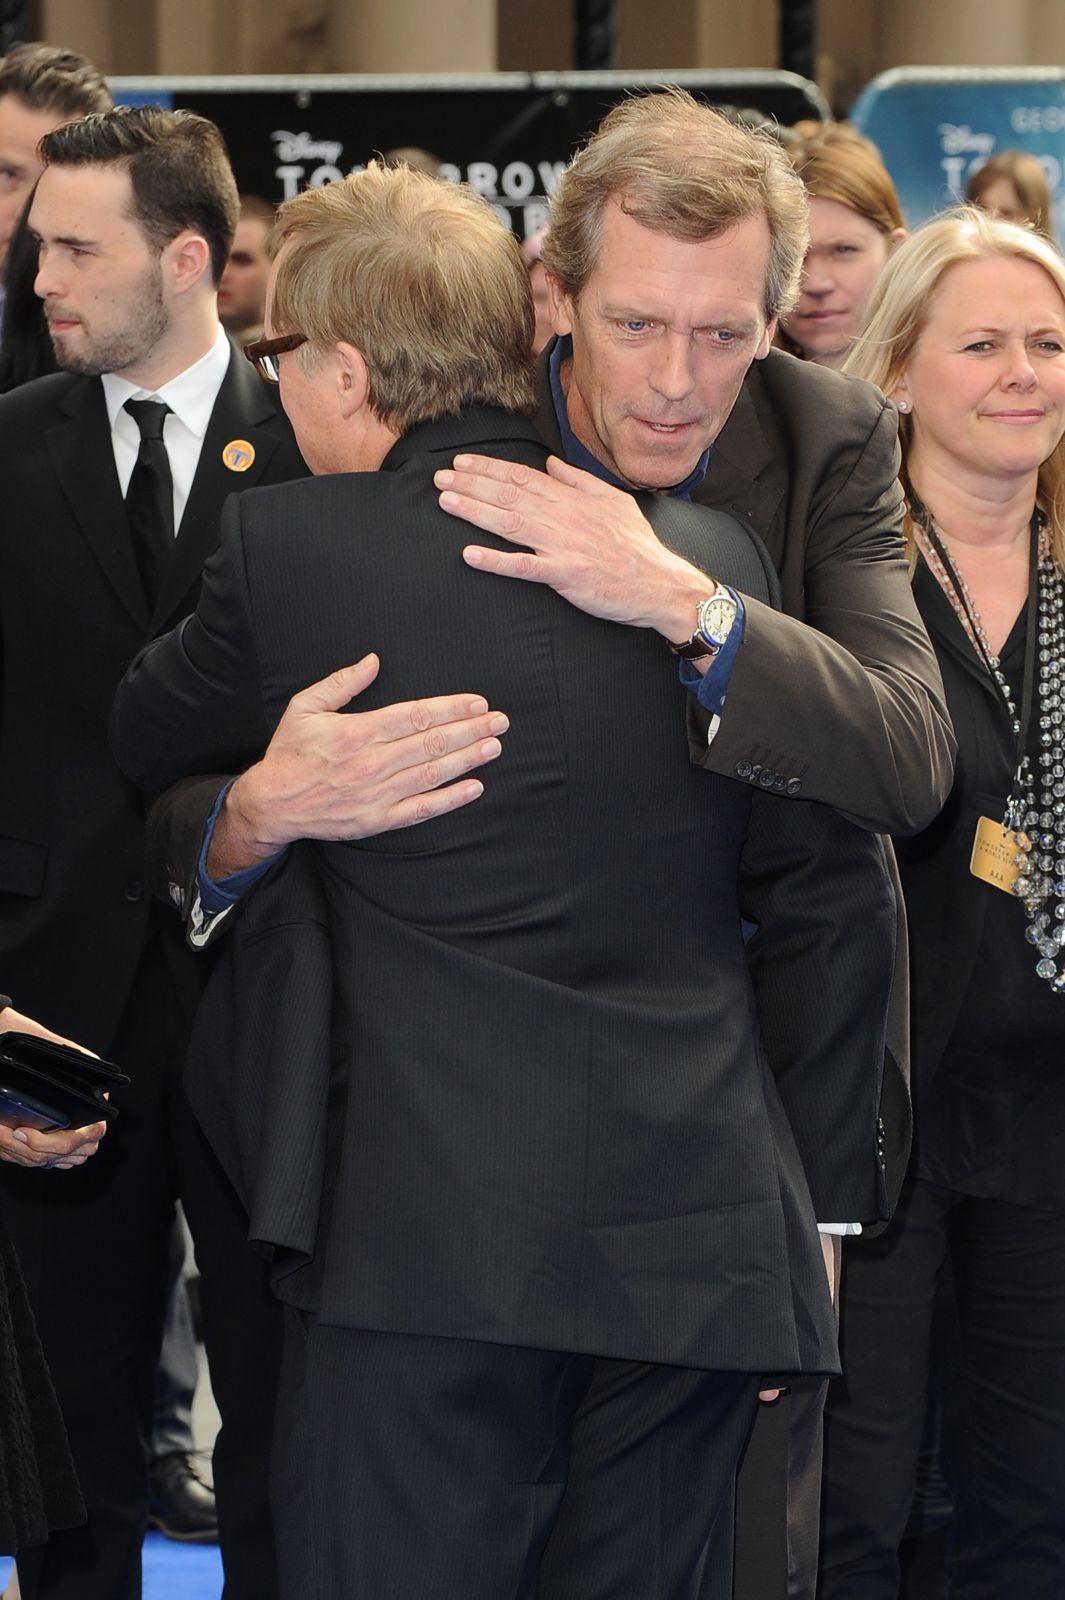 Hugh Laurie74 - Tomorrowland Premiere London 2015.jpg